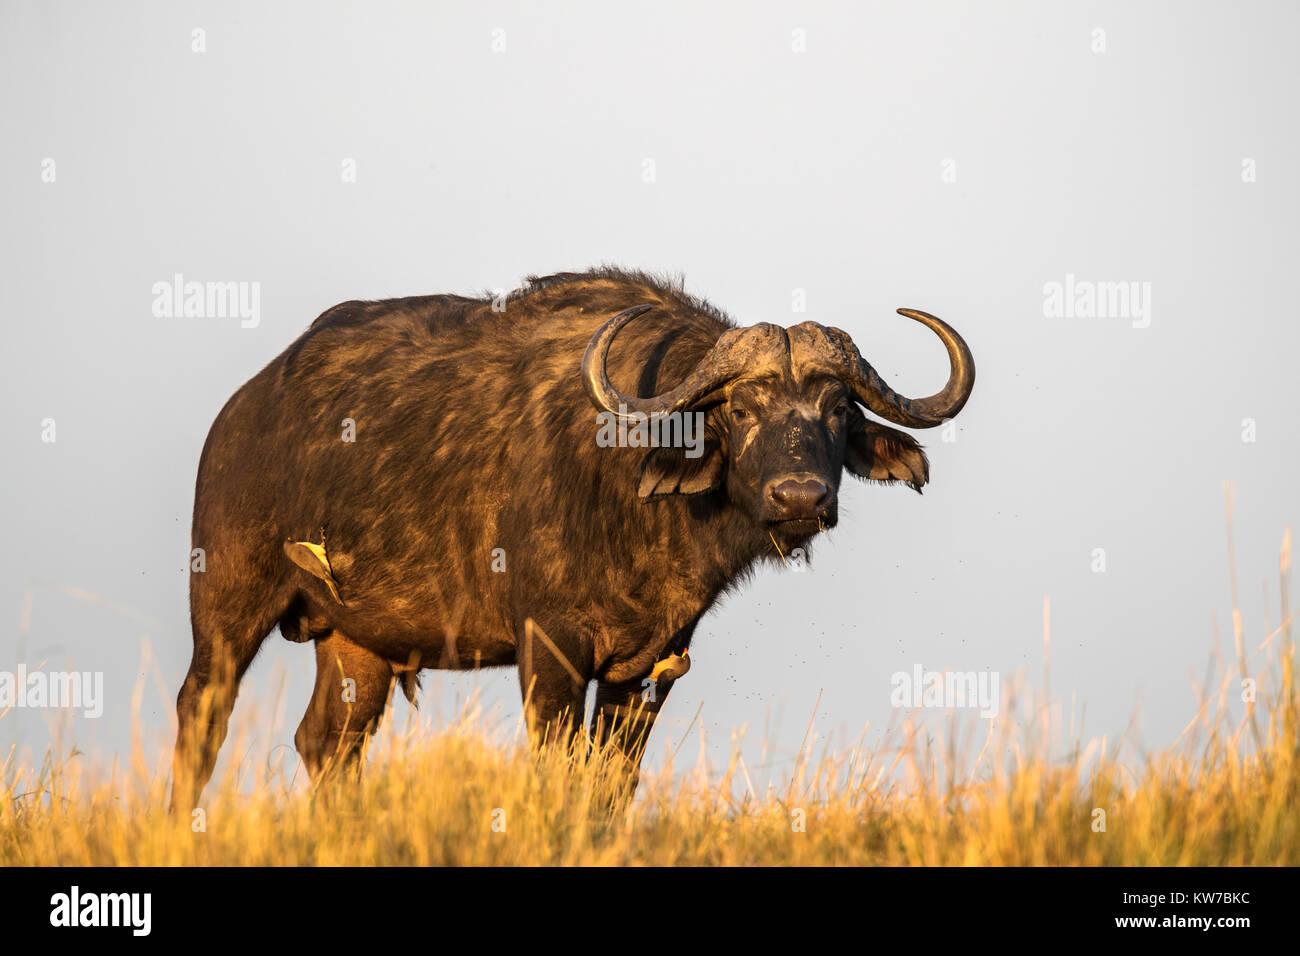 Cape buffalo (Syncerus caffer), Chobe river, Botswana, June 2017 Stock Photo